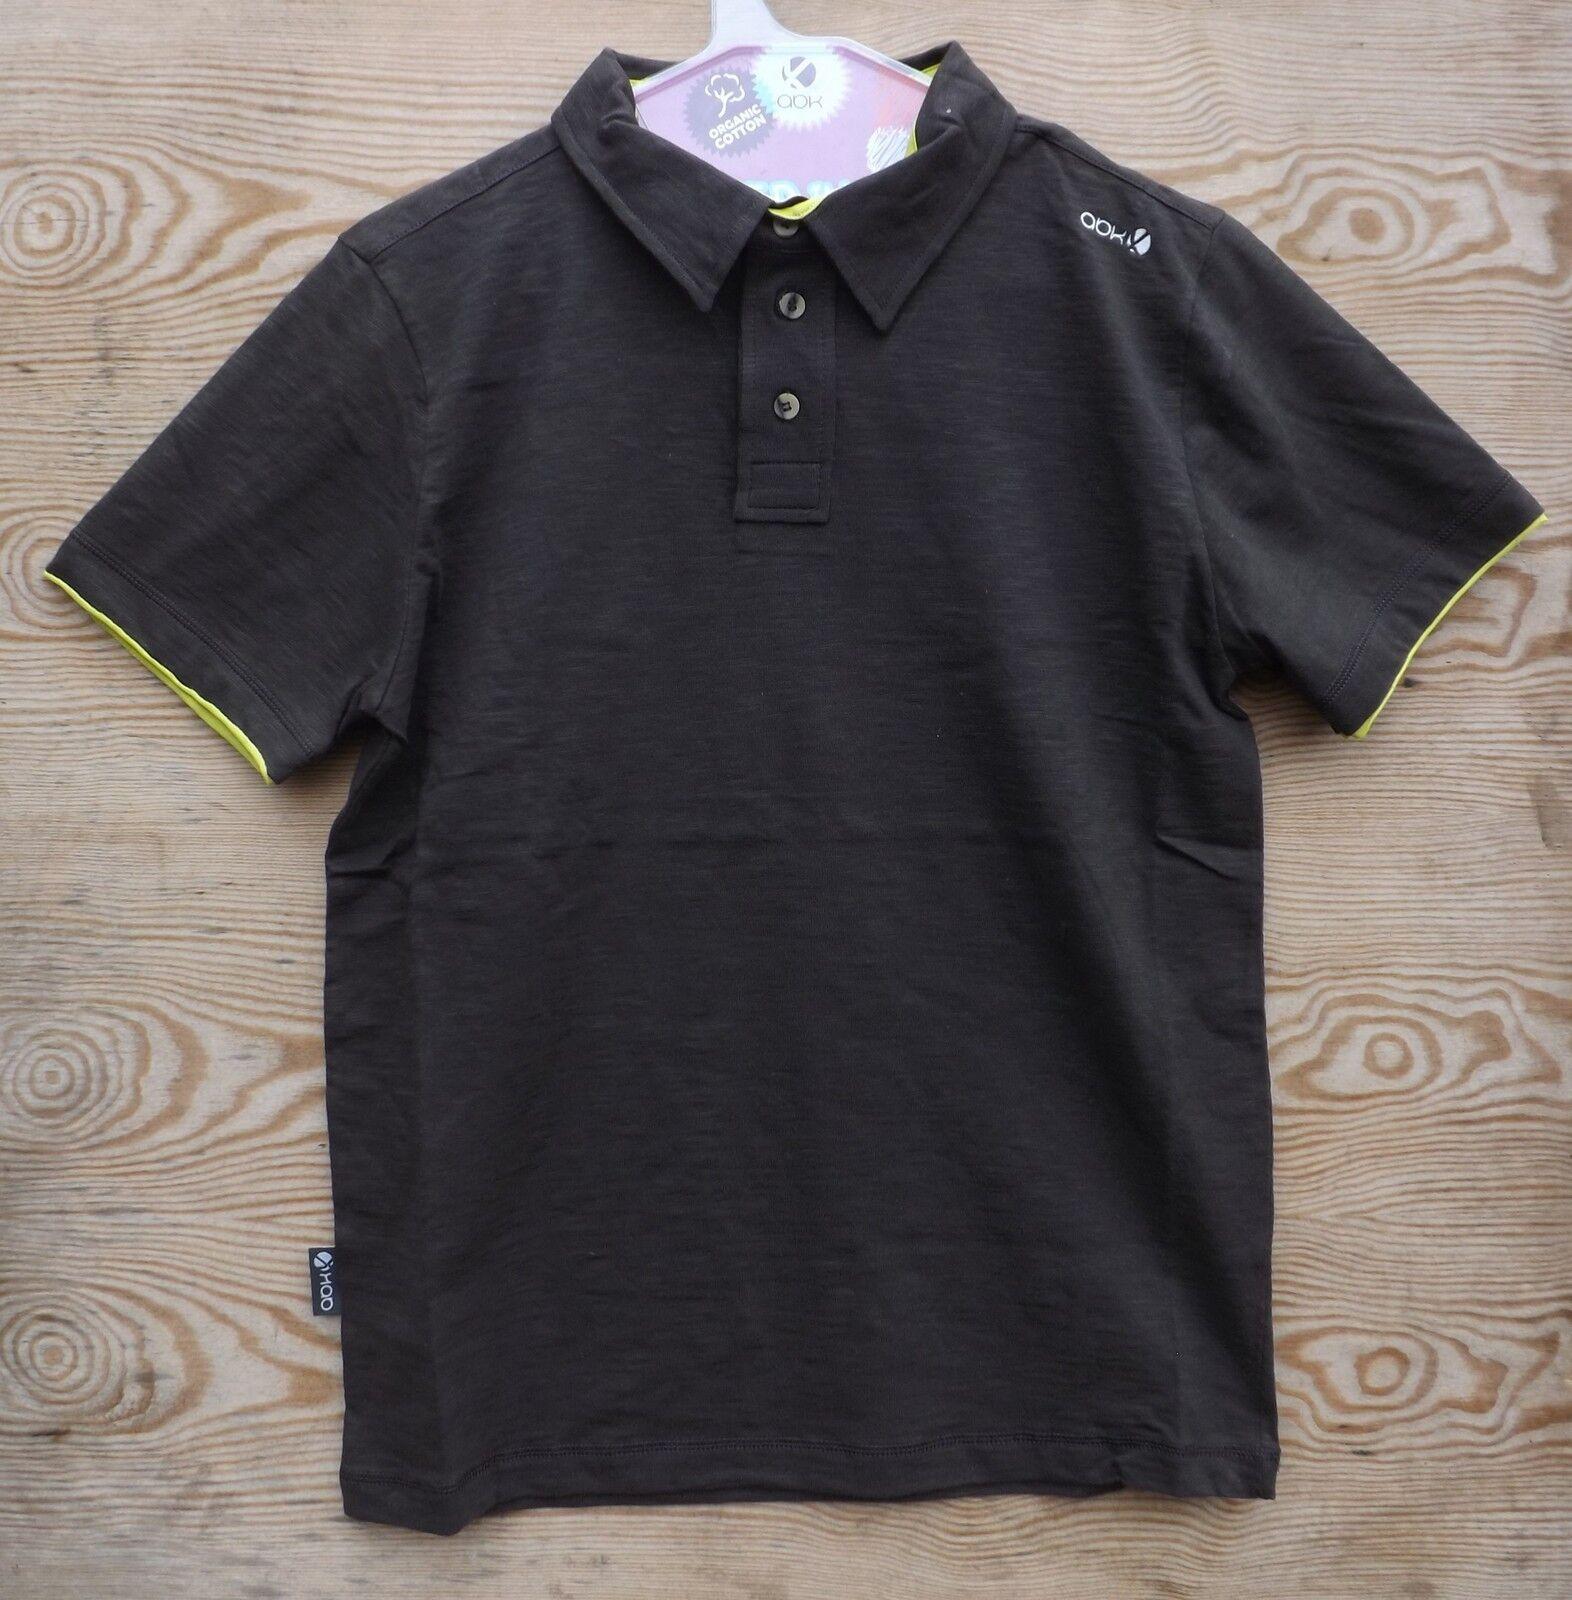 Ny rope polo t-shirt,, talla  s, suave señores t-shirt, Coffee  buena reputación